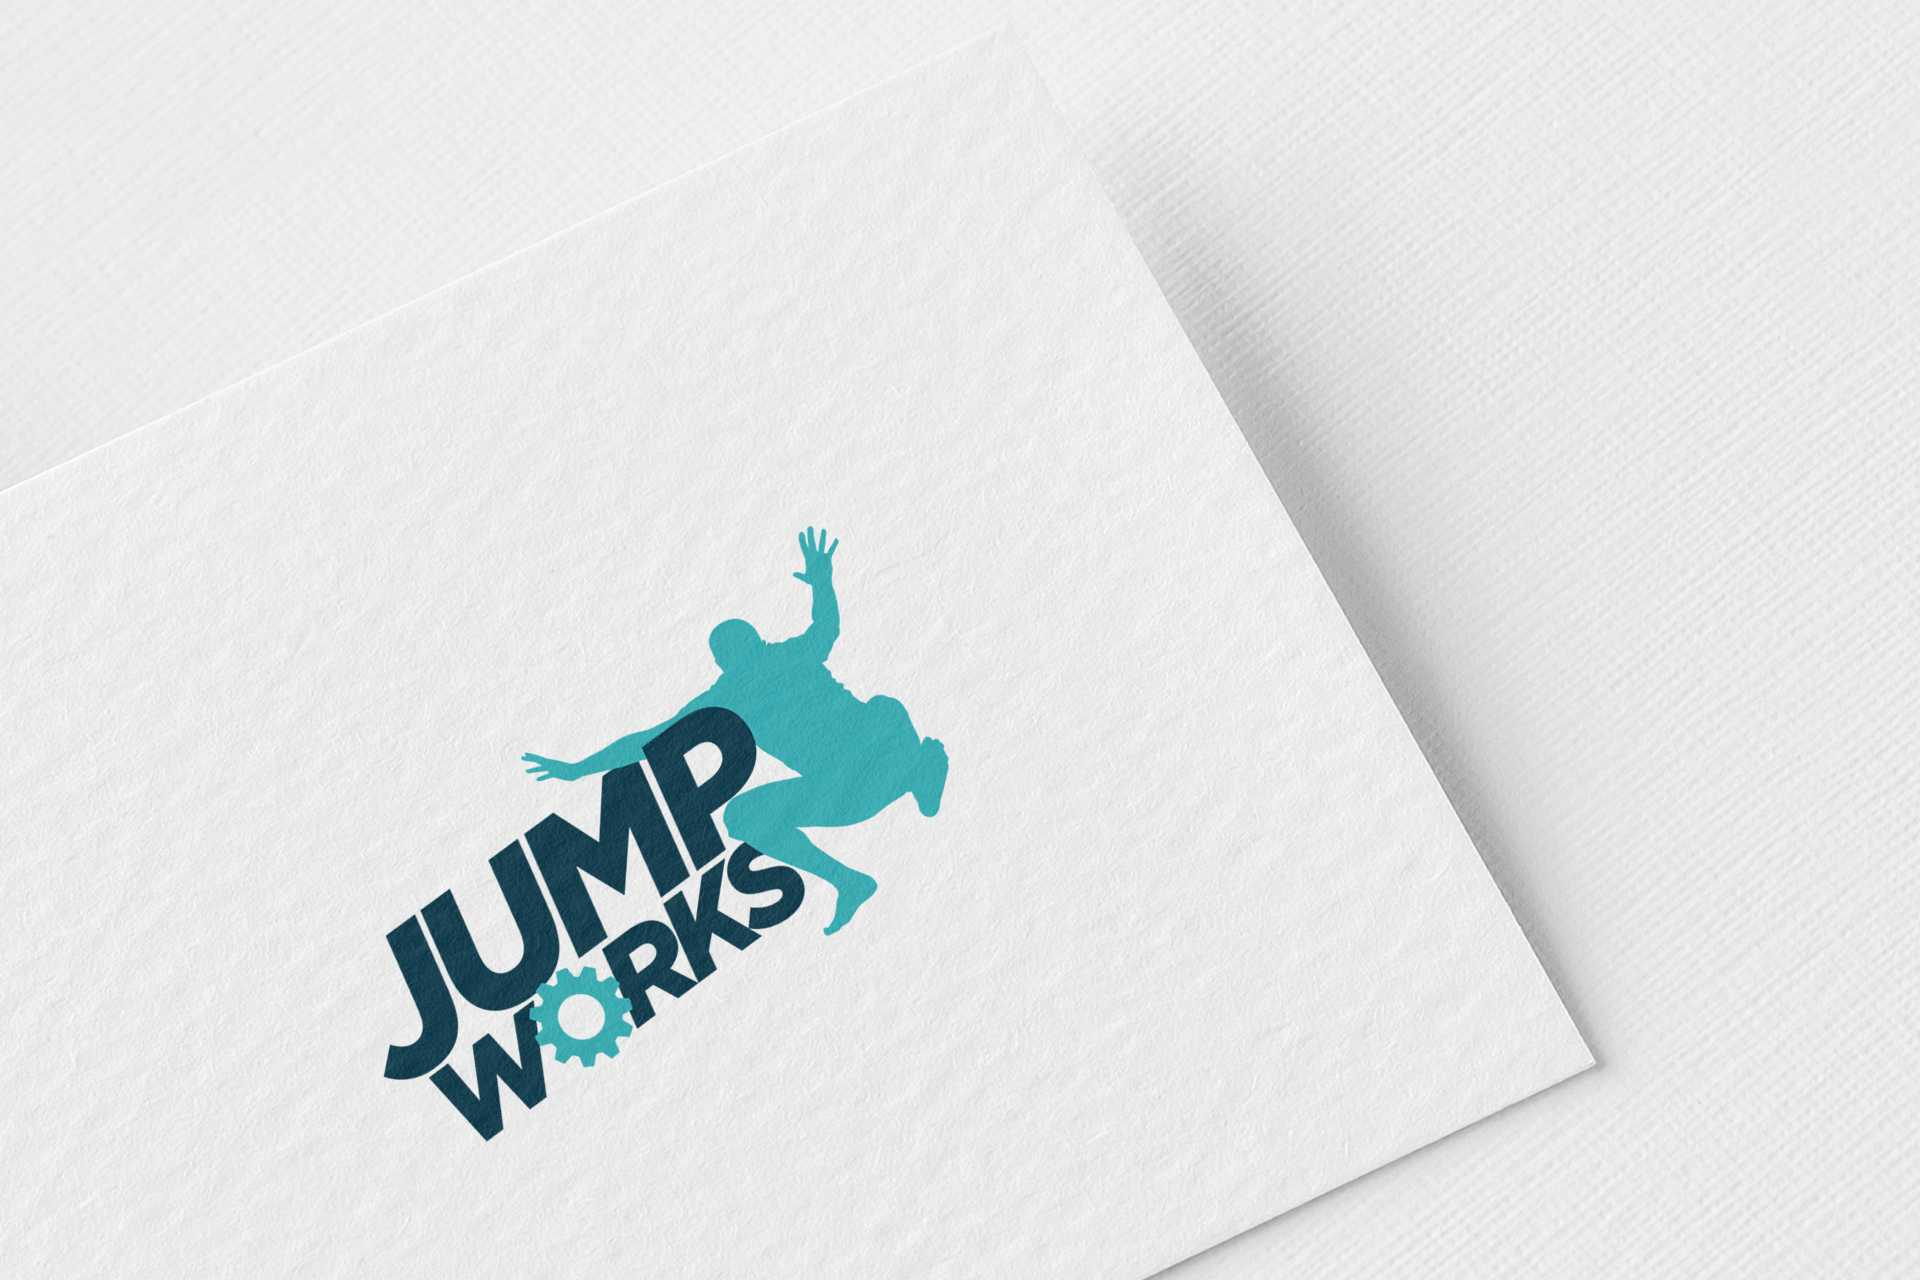 pixel-perfect-warrington-jump-works-logo-design